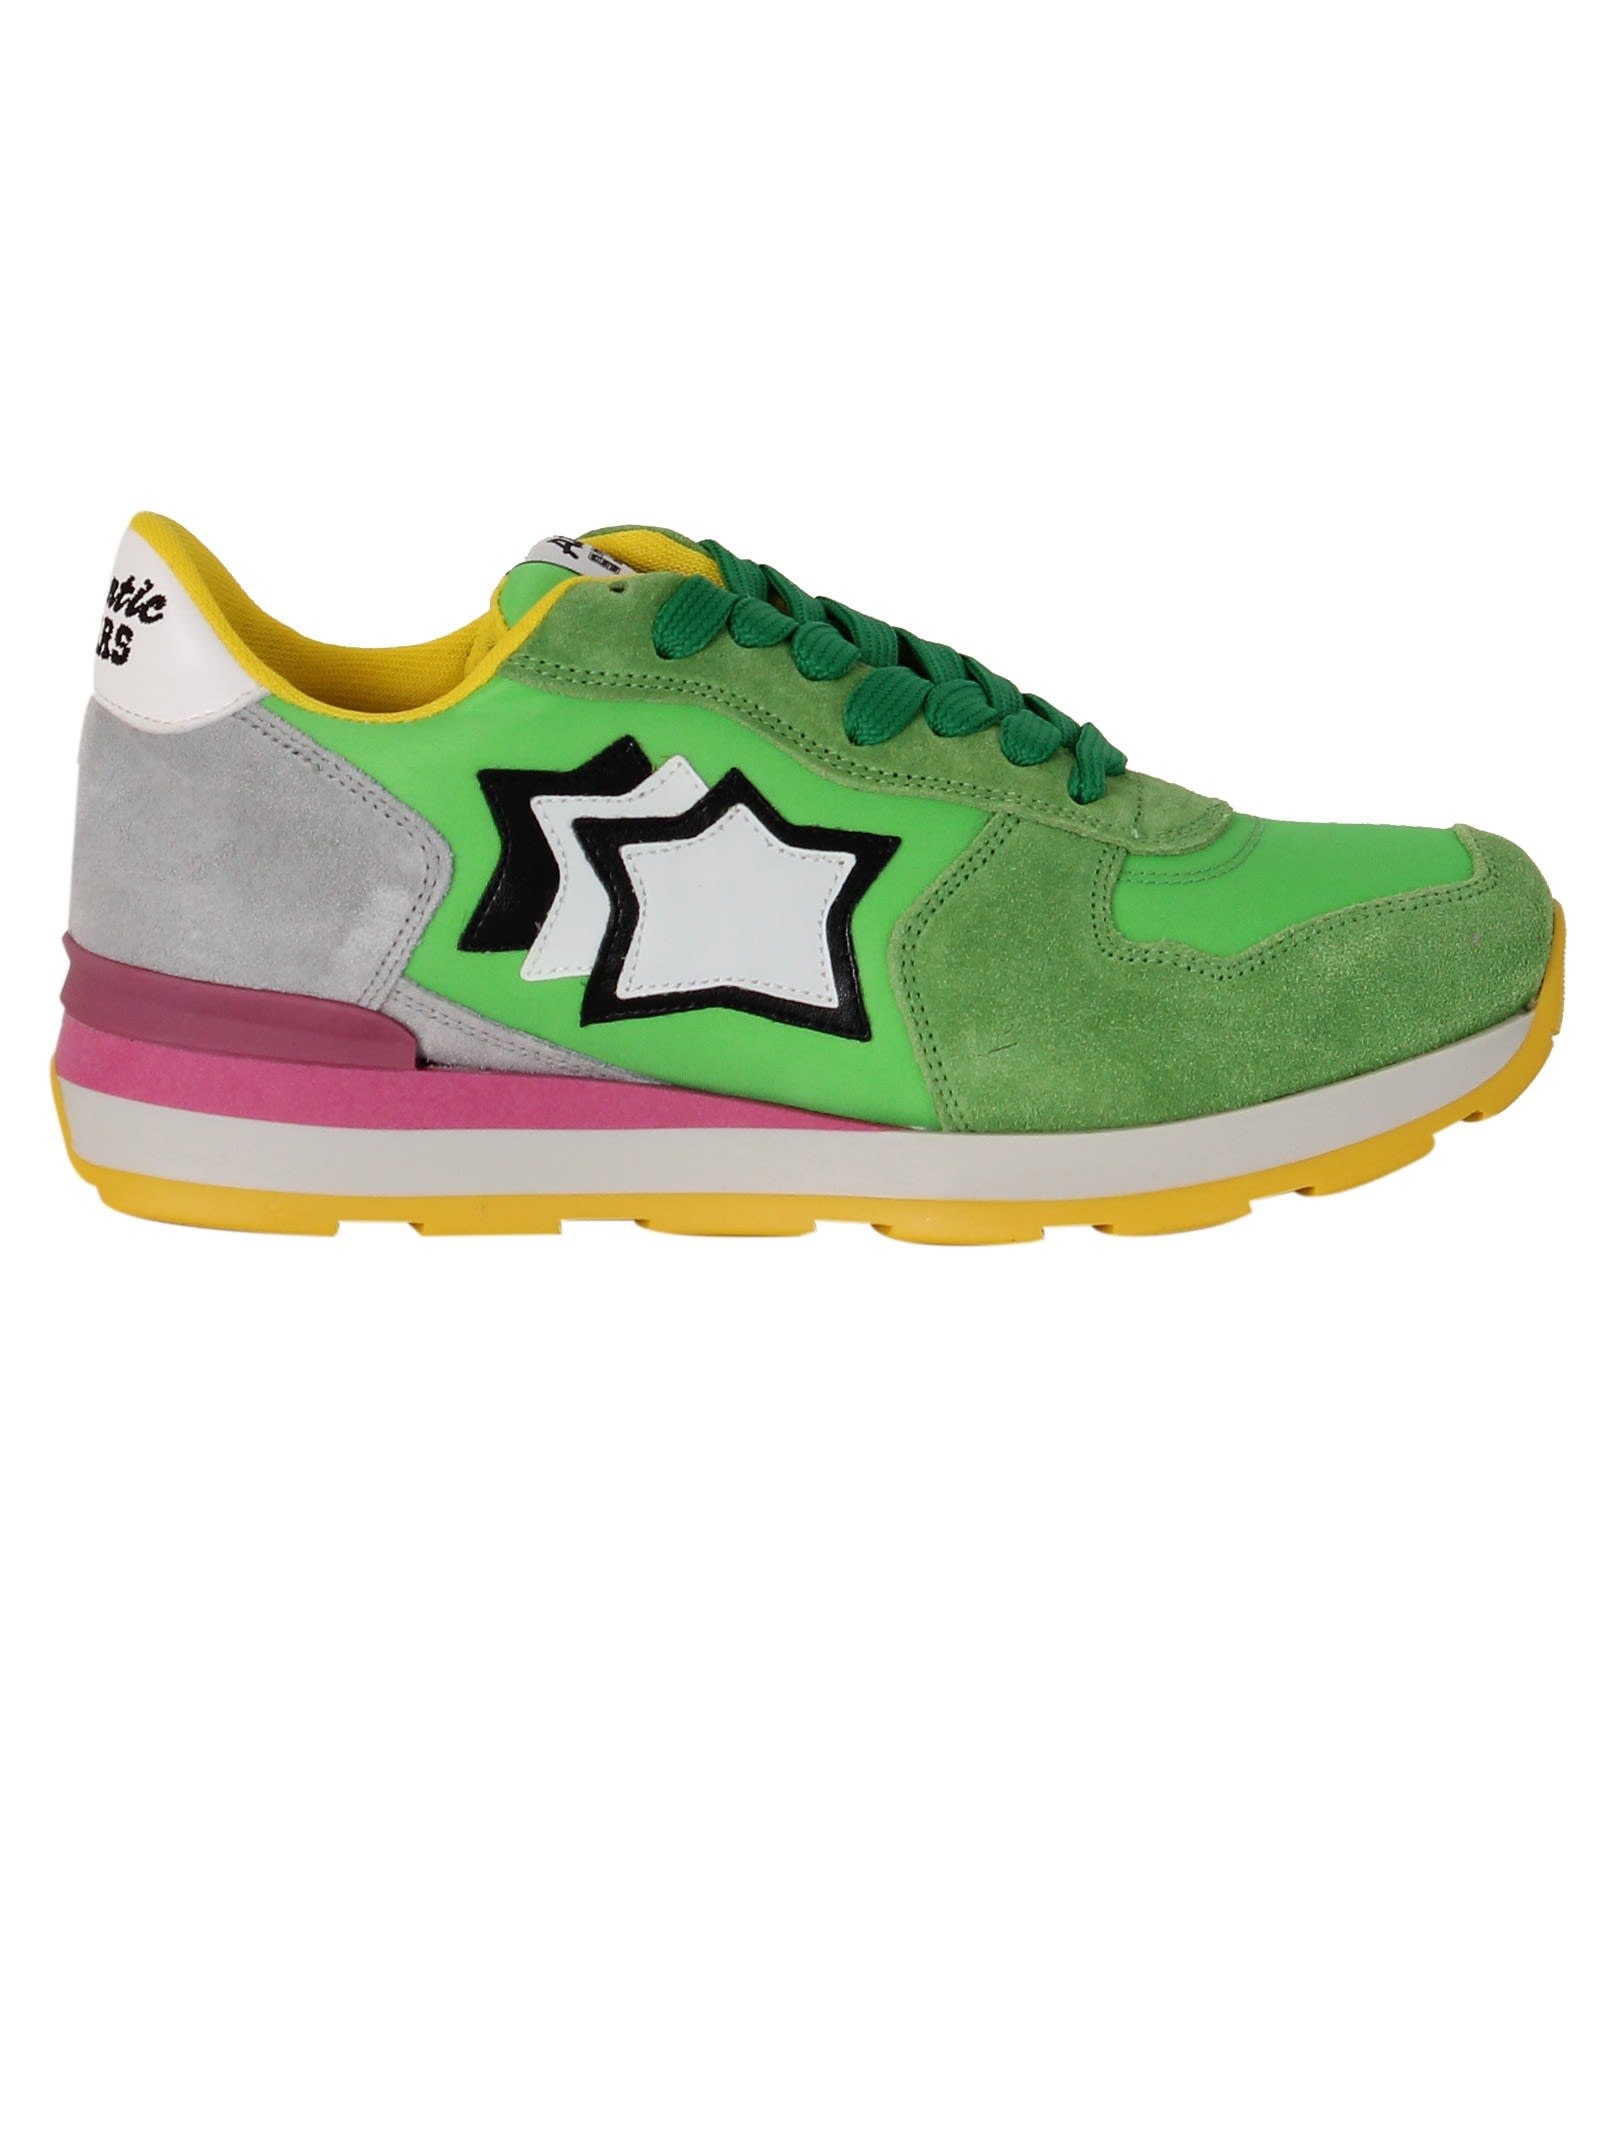 Vega sneakers - Green Atlantic Stars kHOn9U